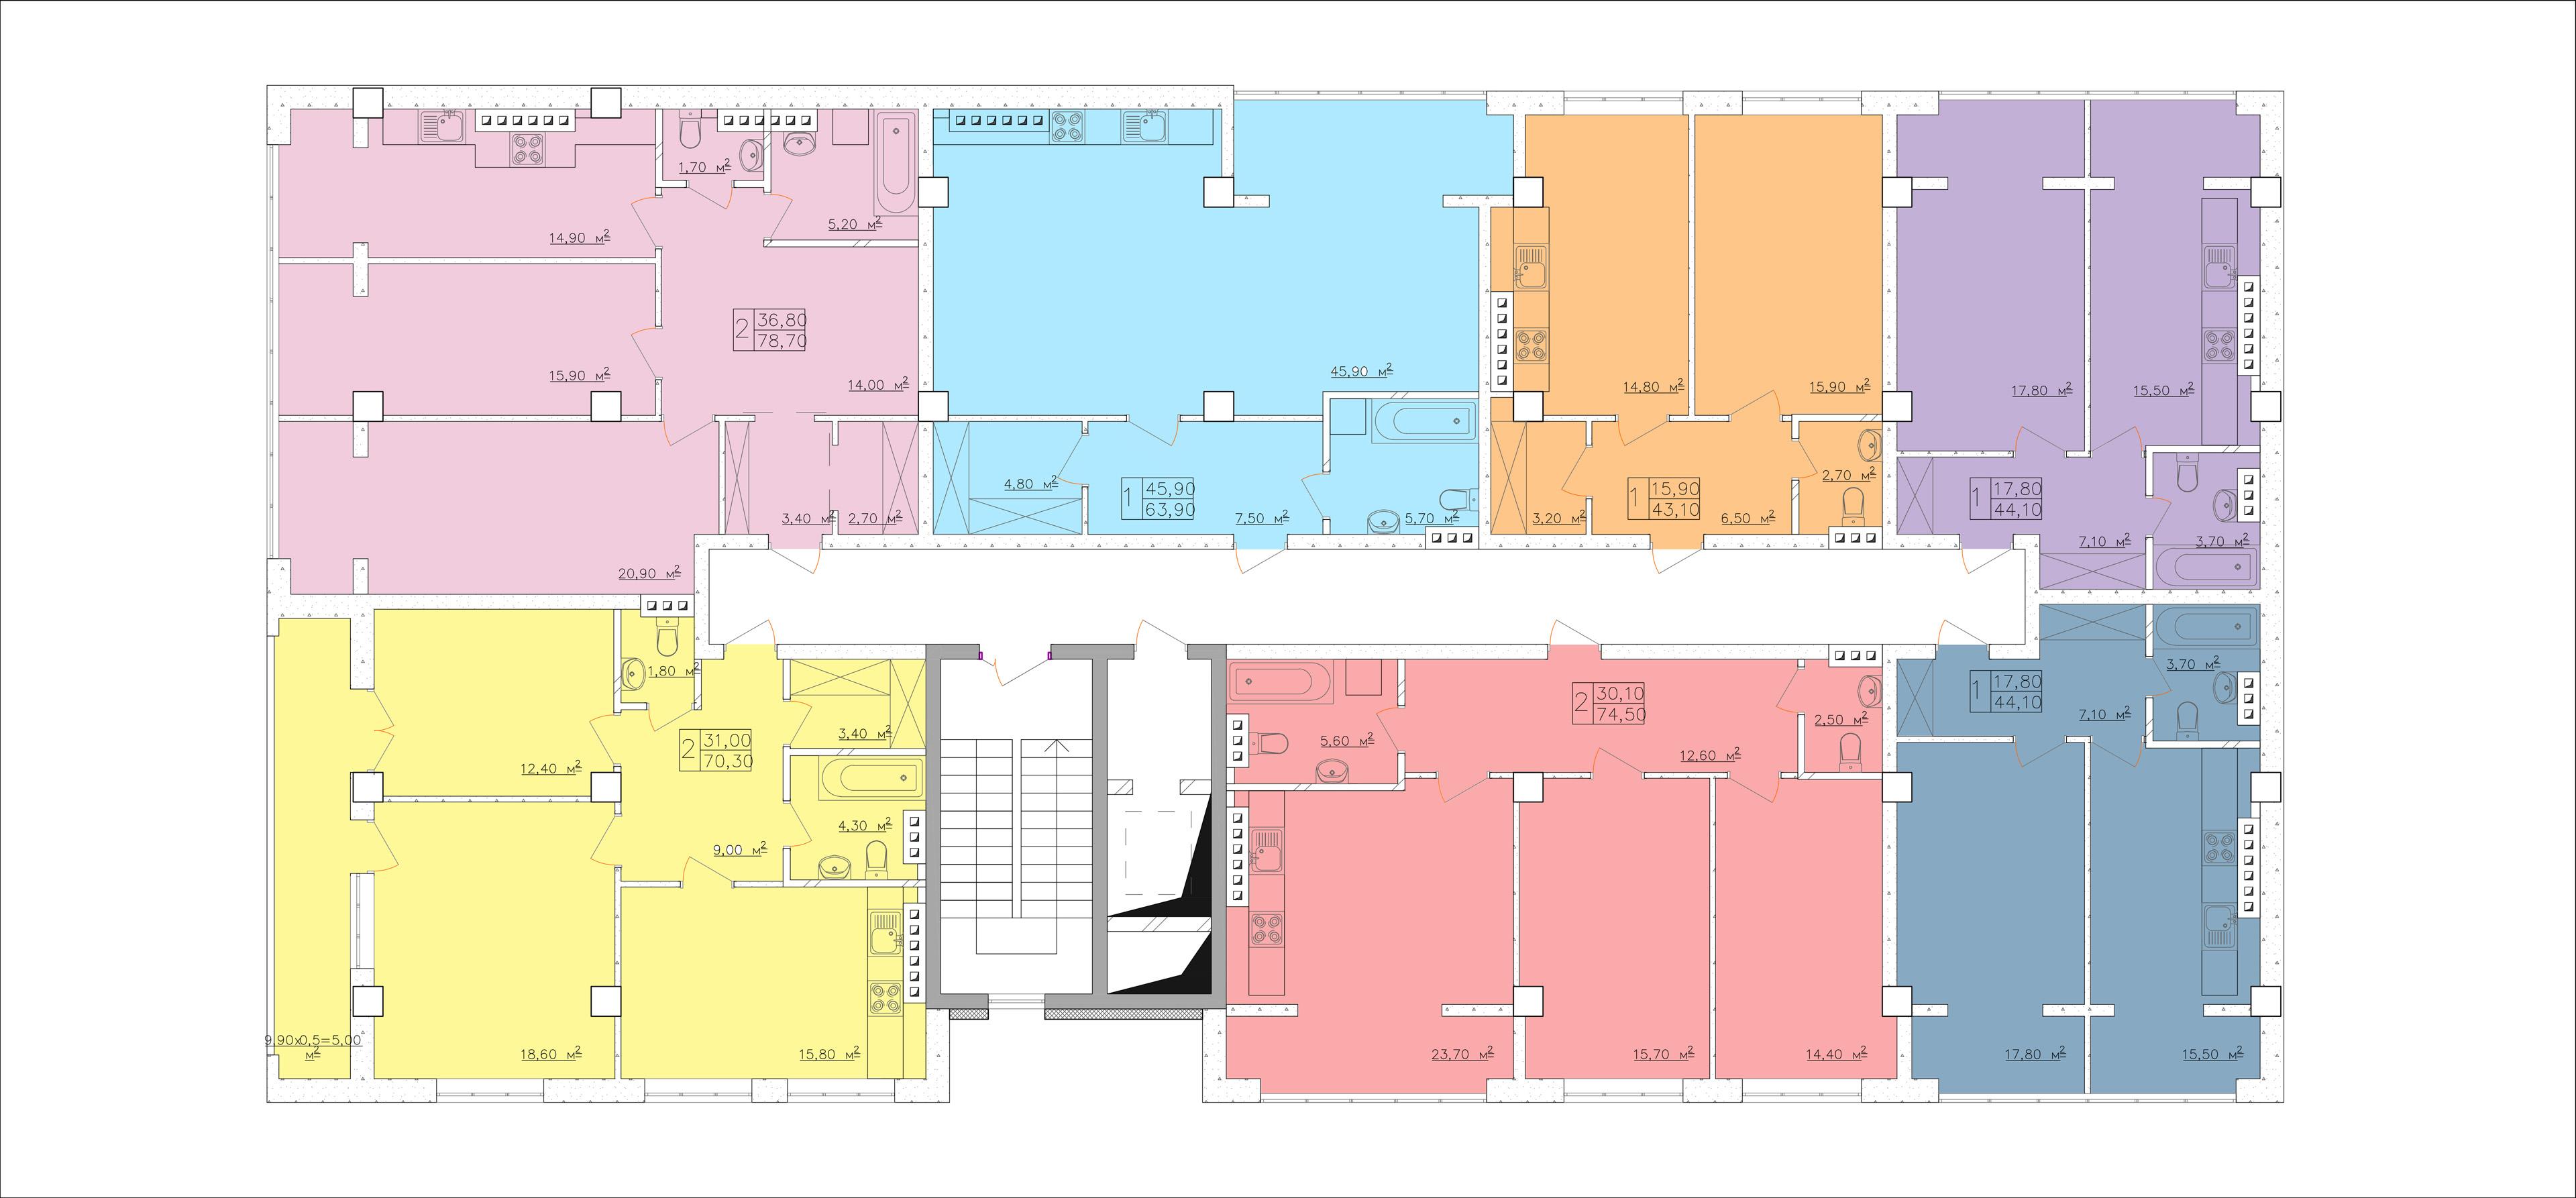 ЖК Club-marine. План этажа - секция 2